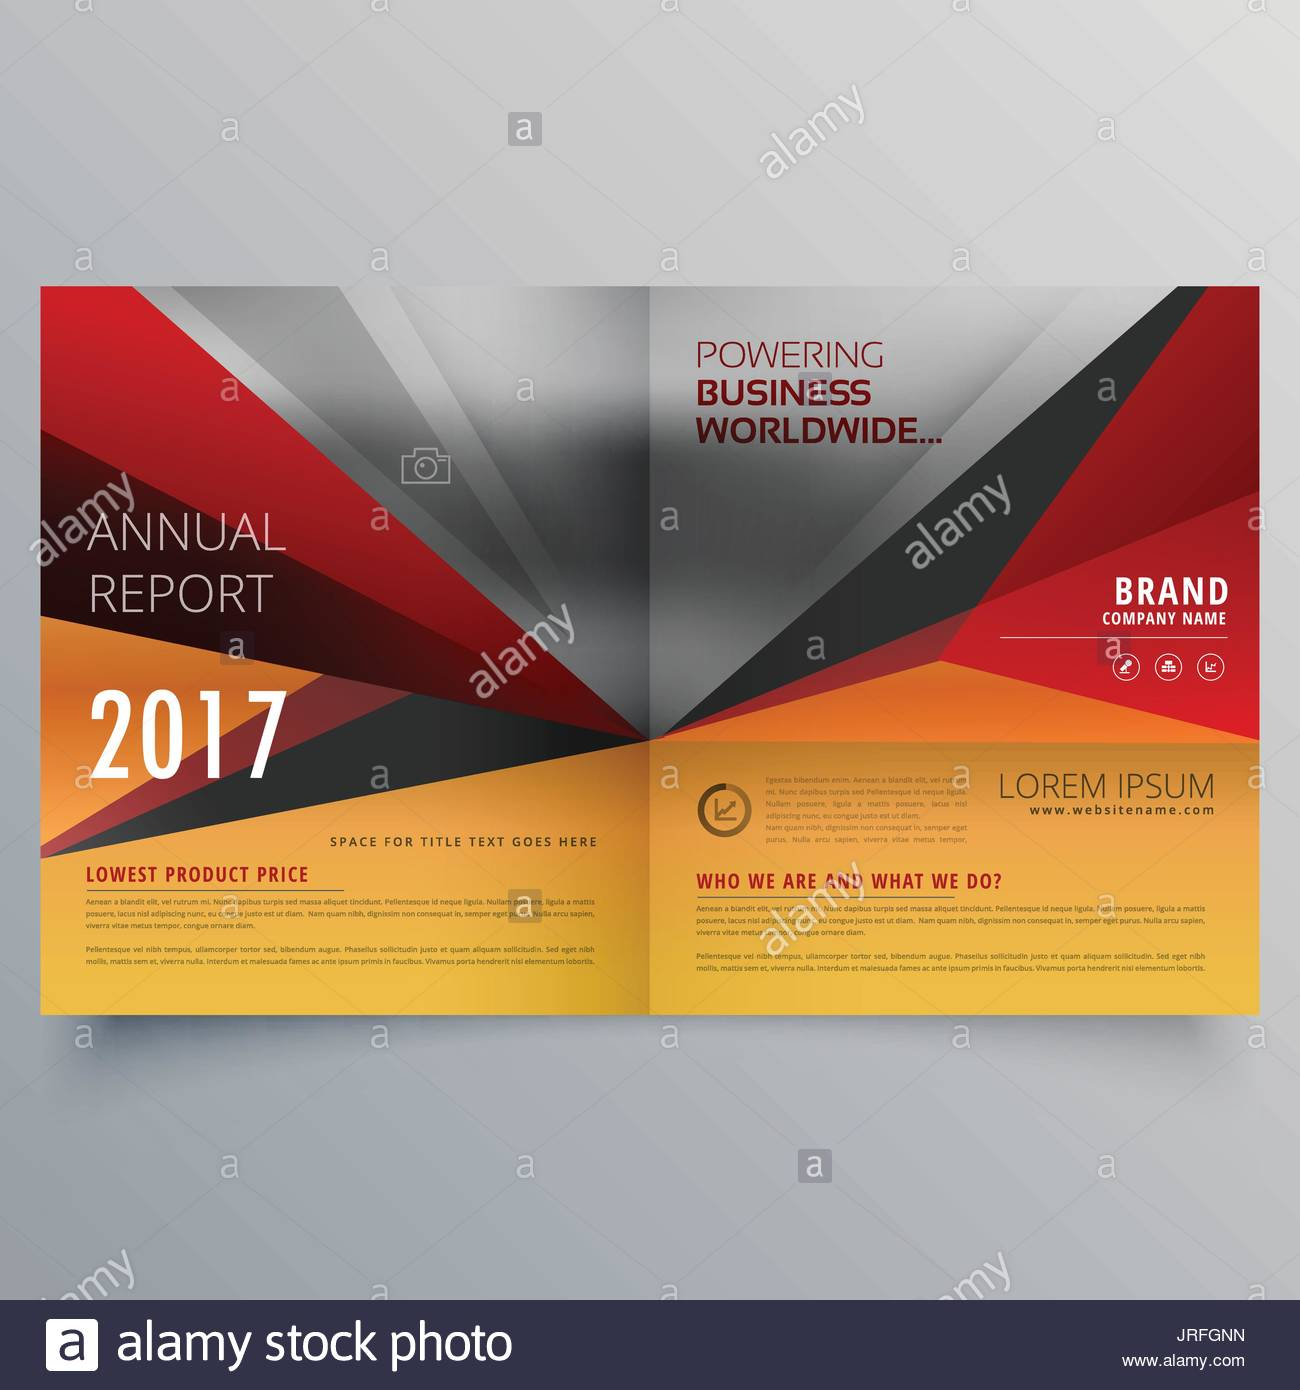 business bifold brochure design with warm colors stock vector art